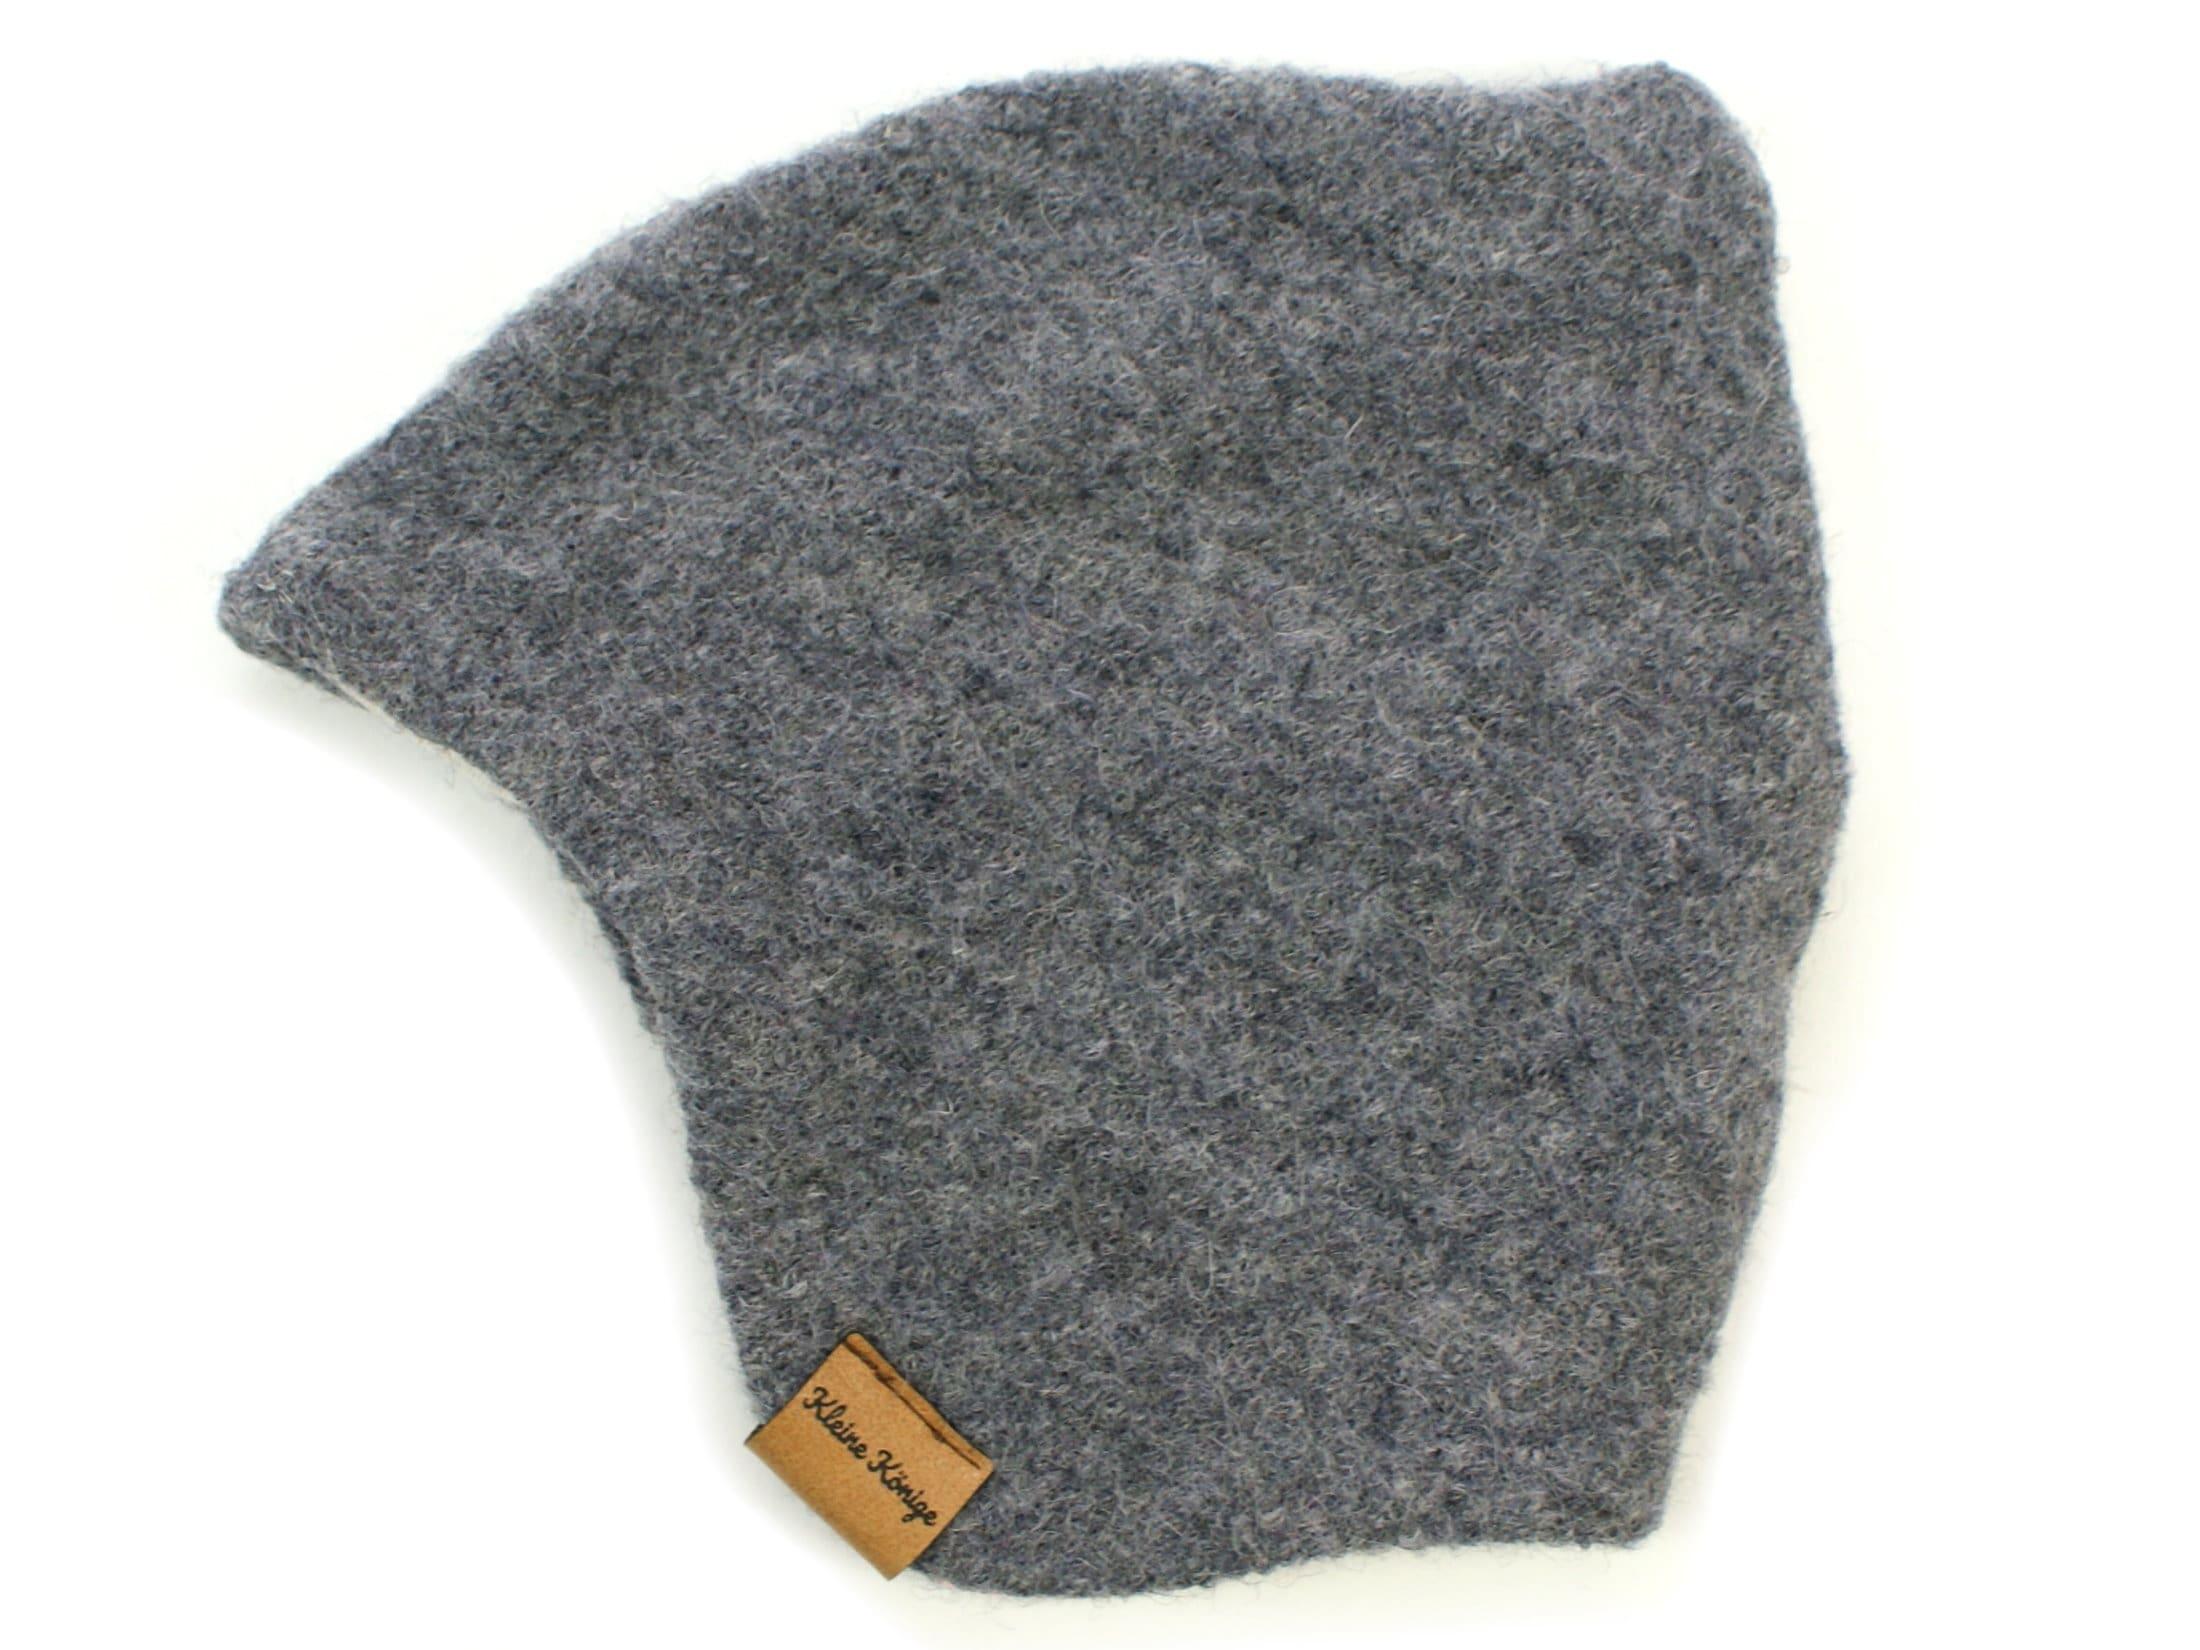 Walkmütze / Kindermütze aus Wollwalk in Grau